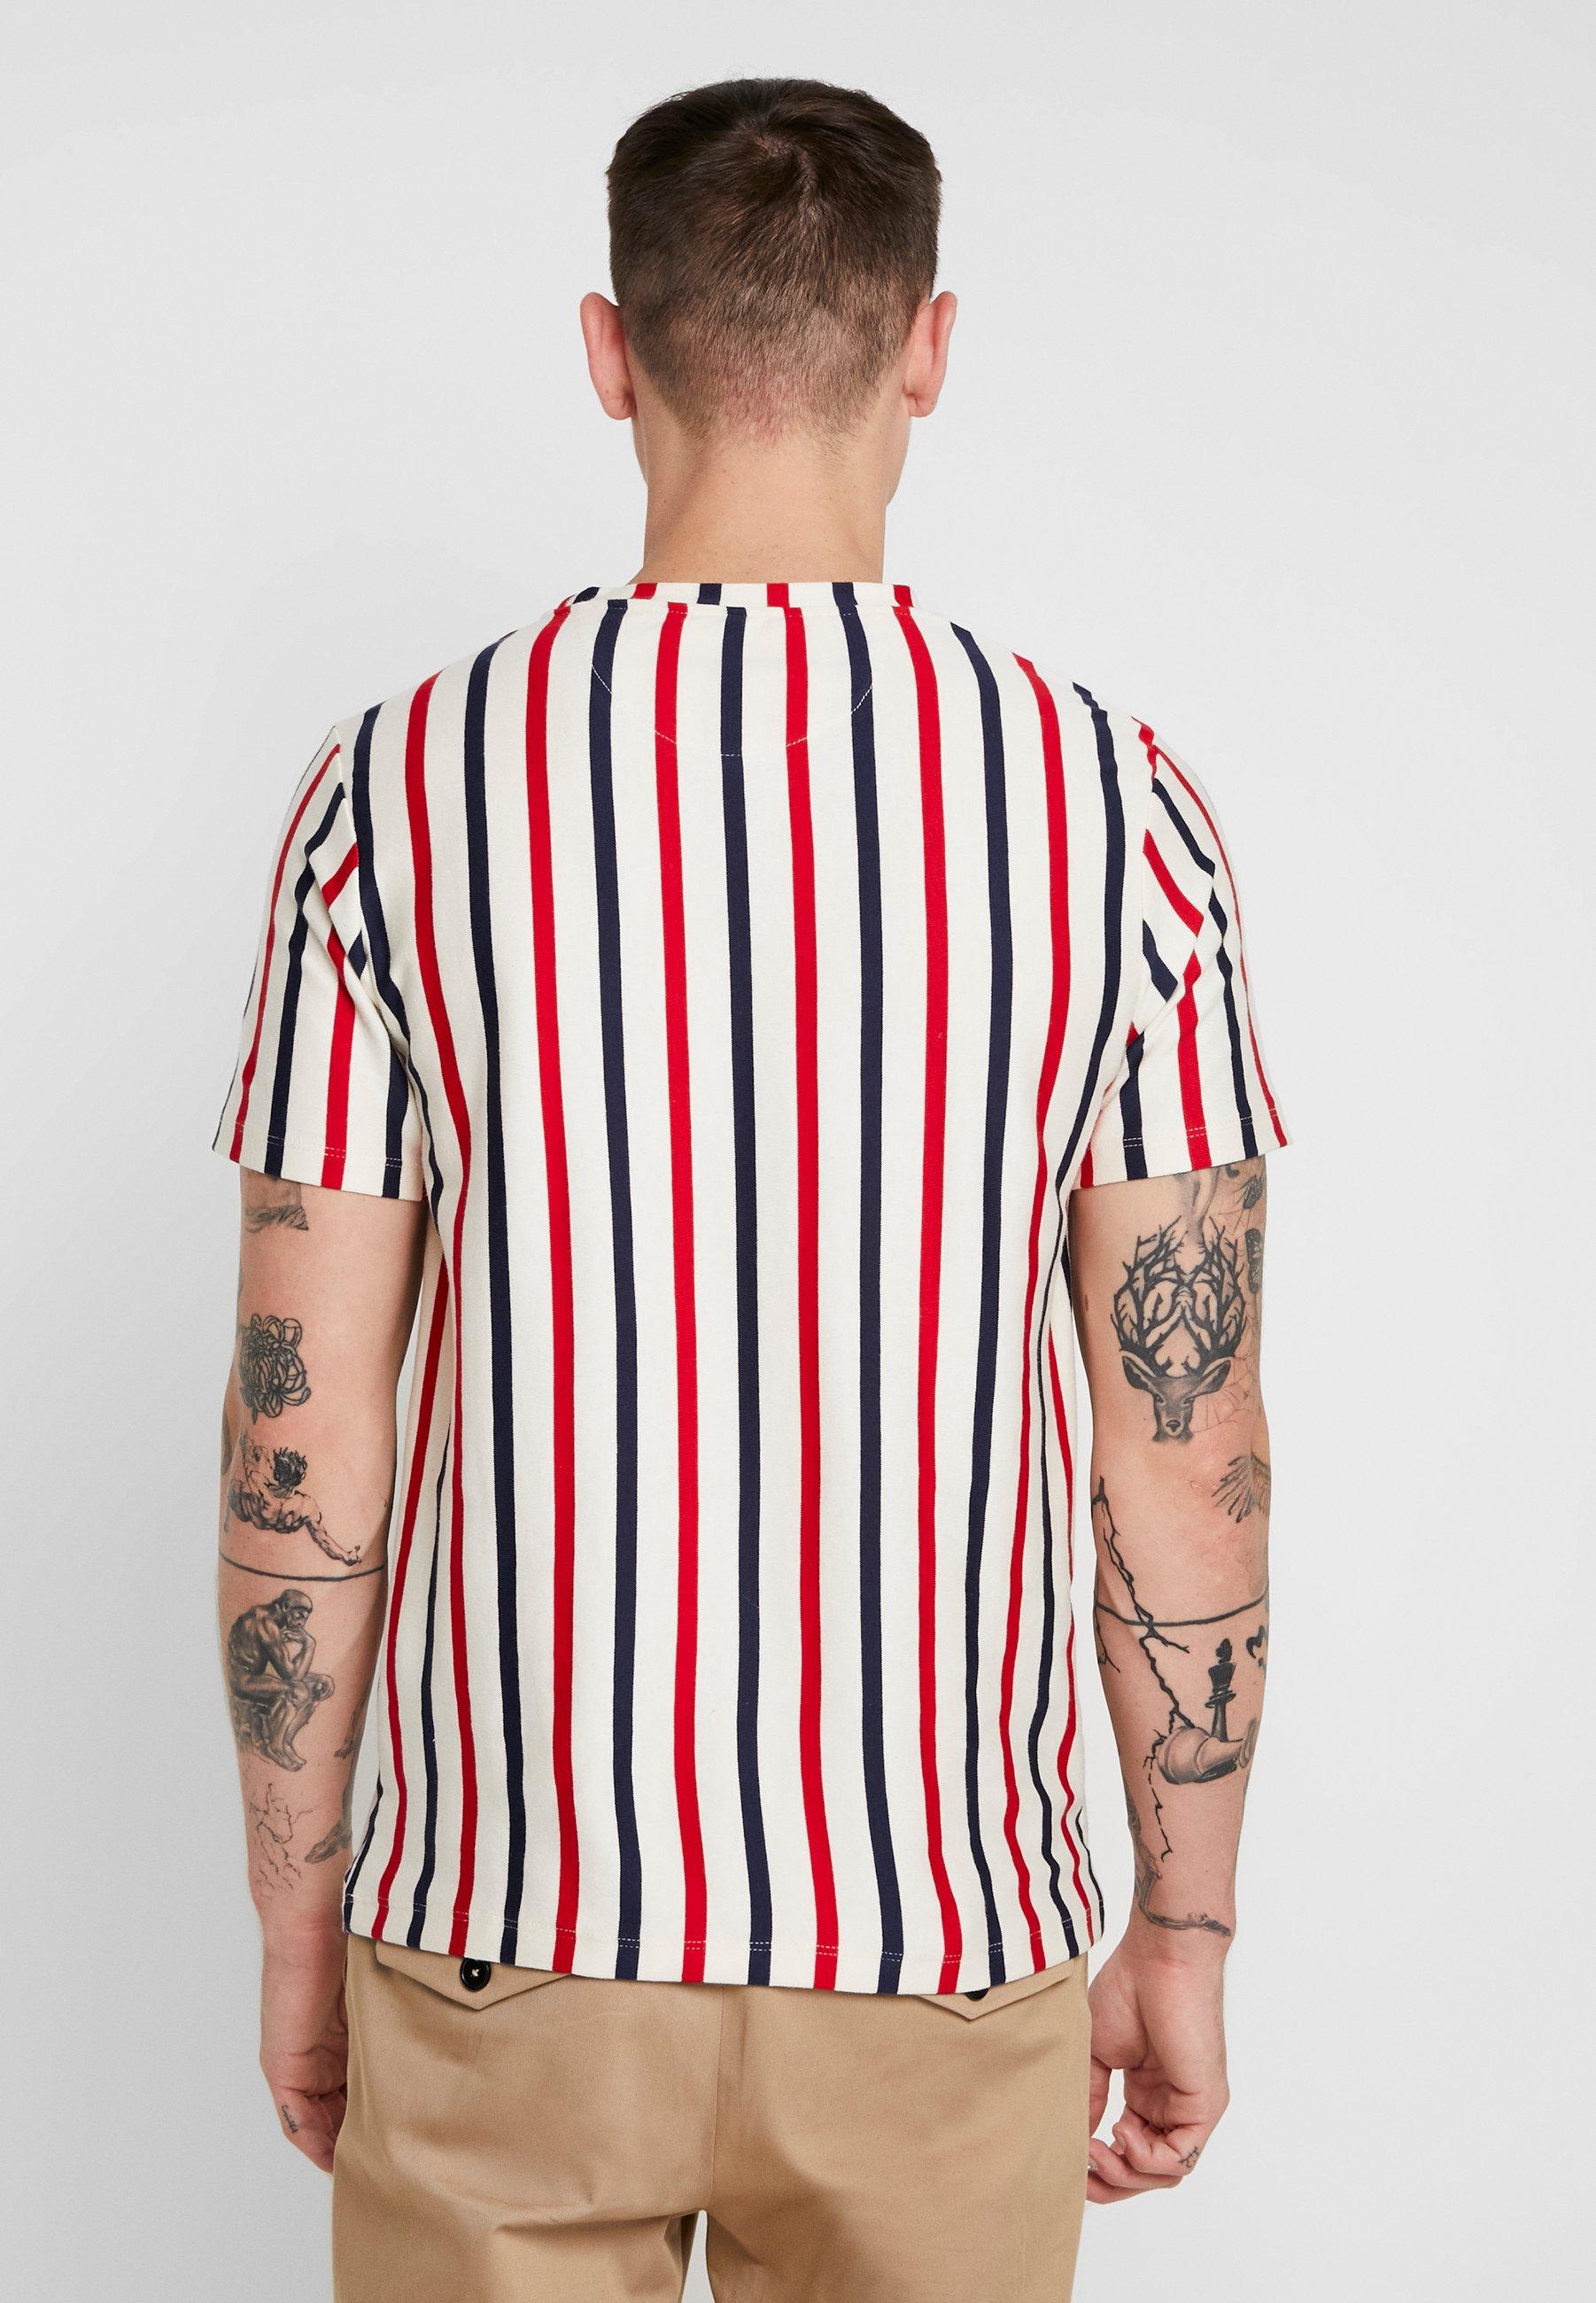 Stipe TeeT shirt Ecru Topman Smart white Imprimé Off KlF13TJc